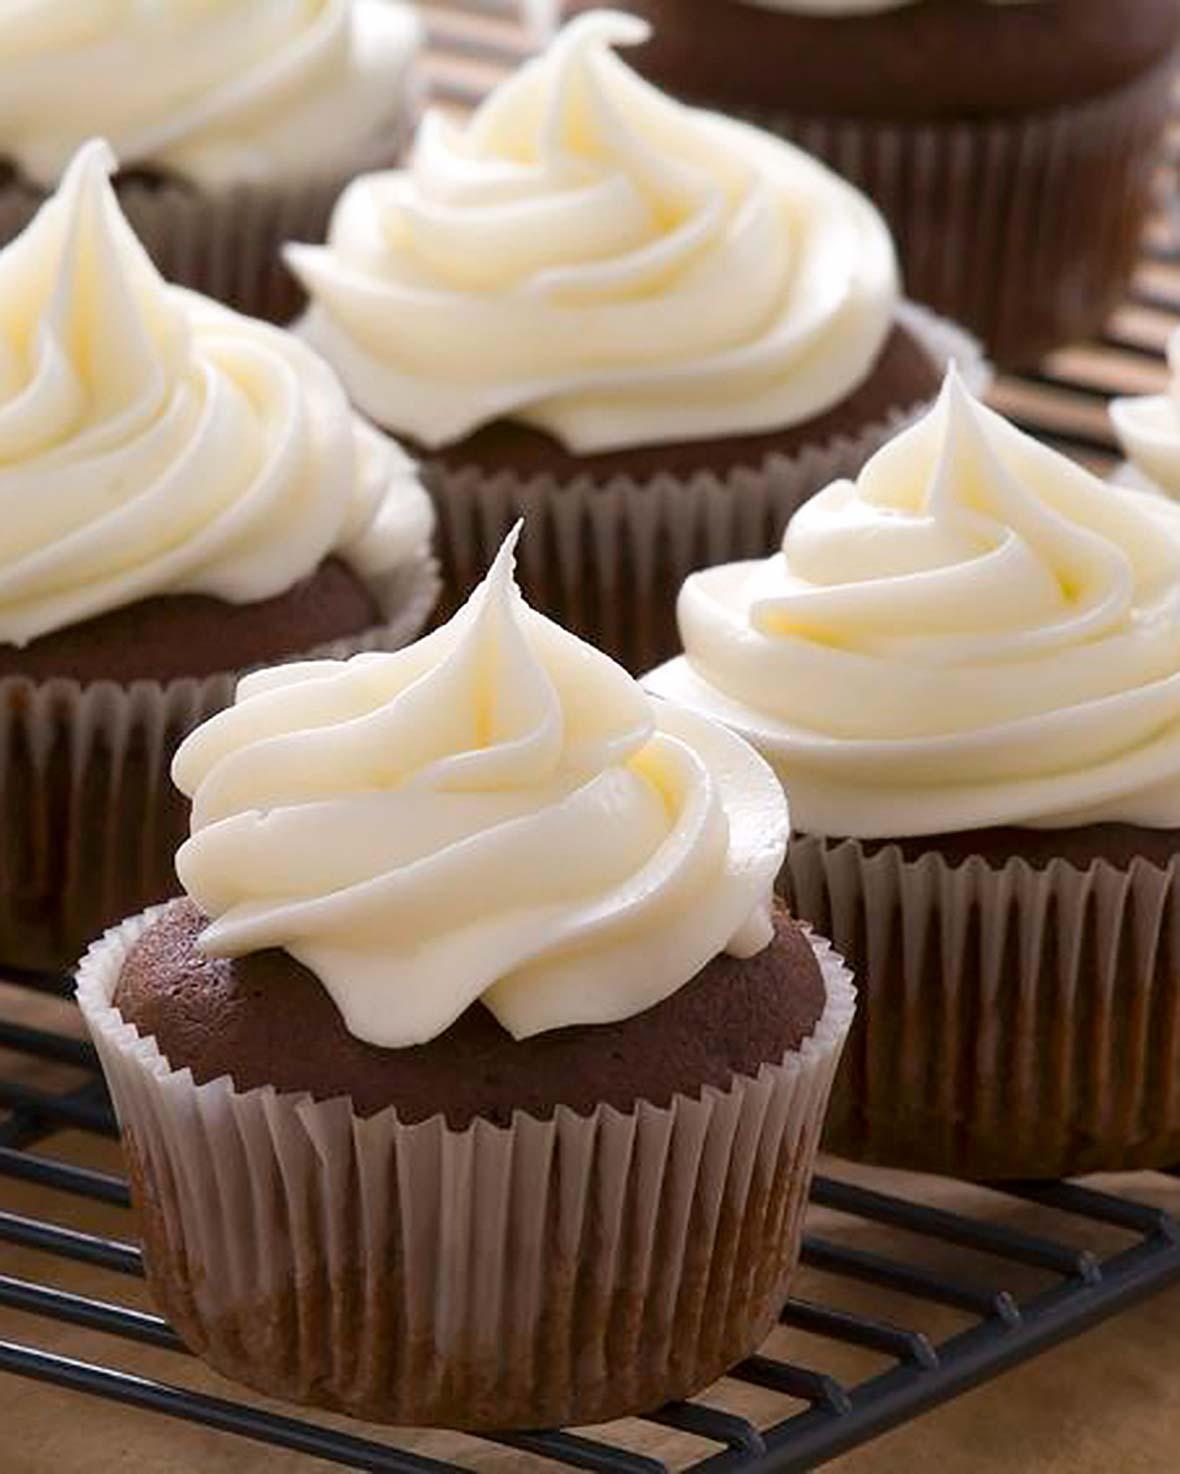 Espresso Cupcakes White Chocolate Frosting Recipe | Leite's Culinaria